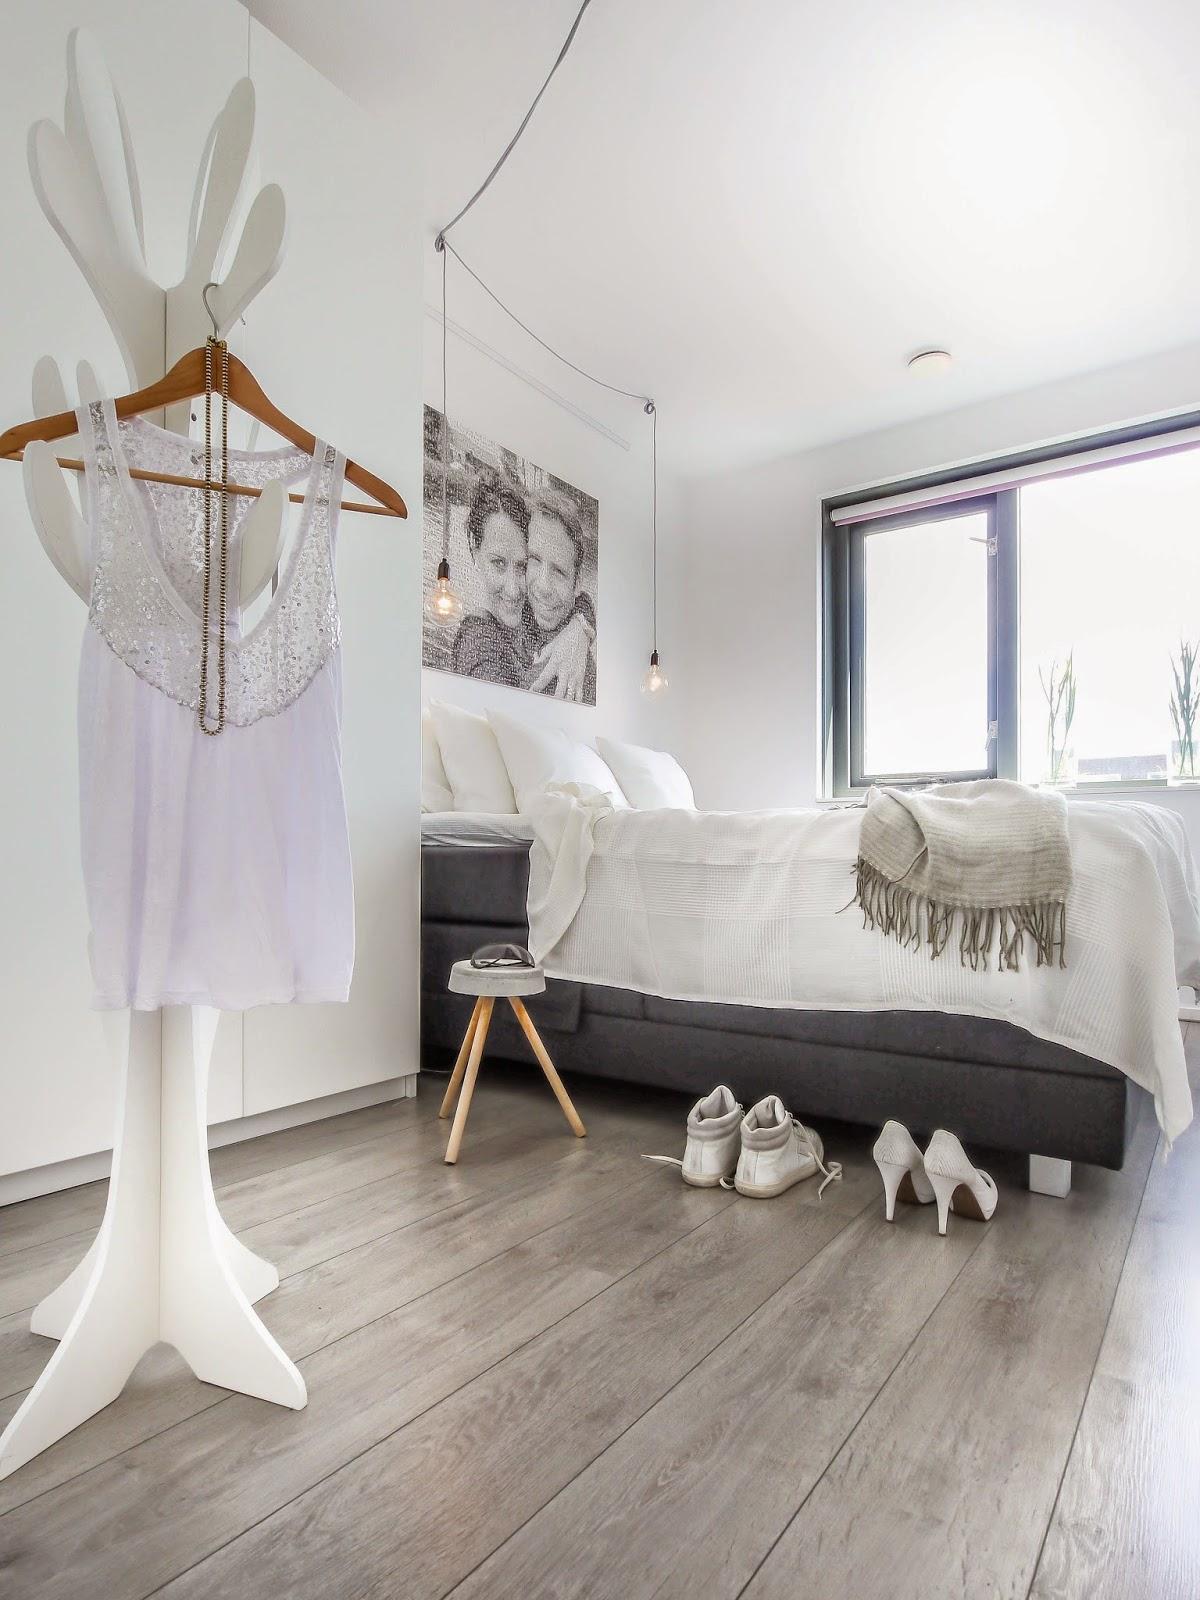 Kleine slaapkamer inrichten kind ~ [spscents.com]